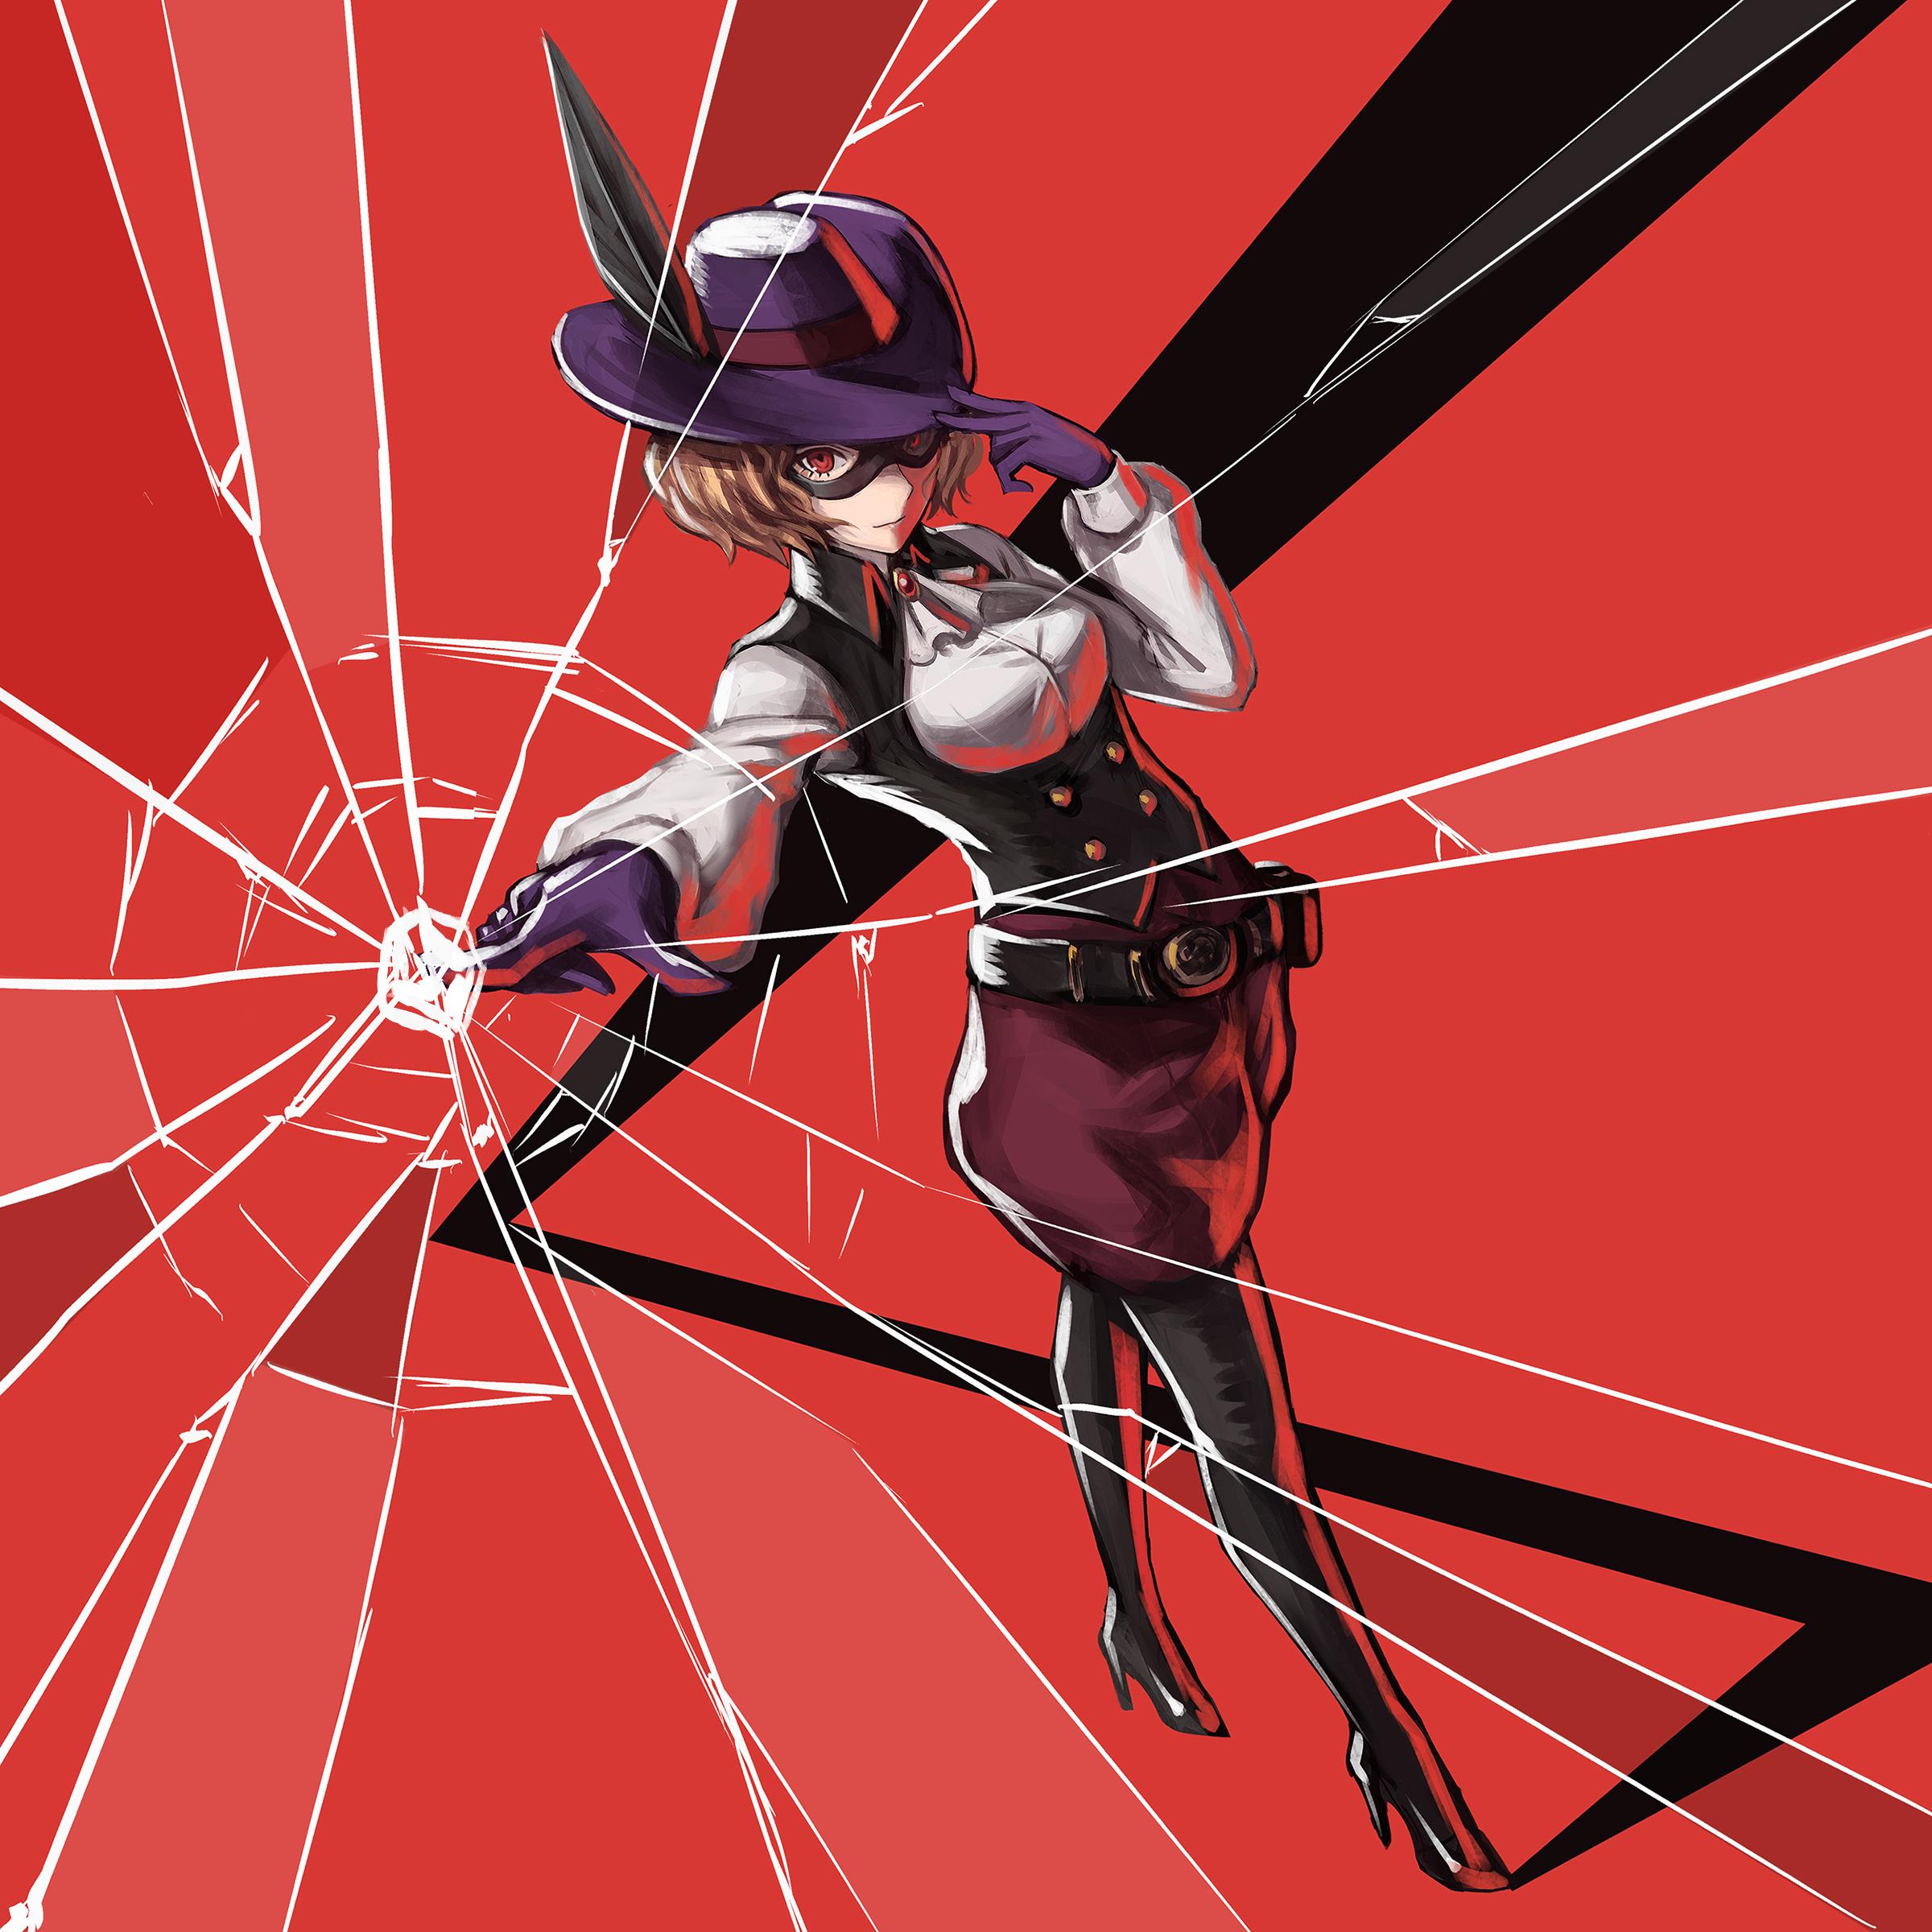 Noir (Persona 5)/#2111032 - Zerochan